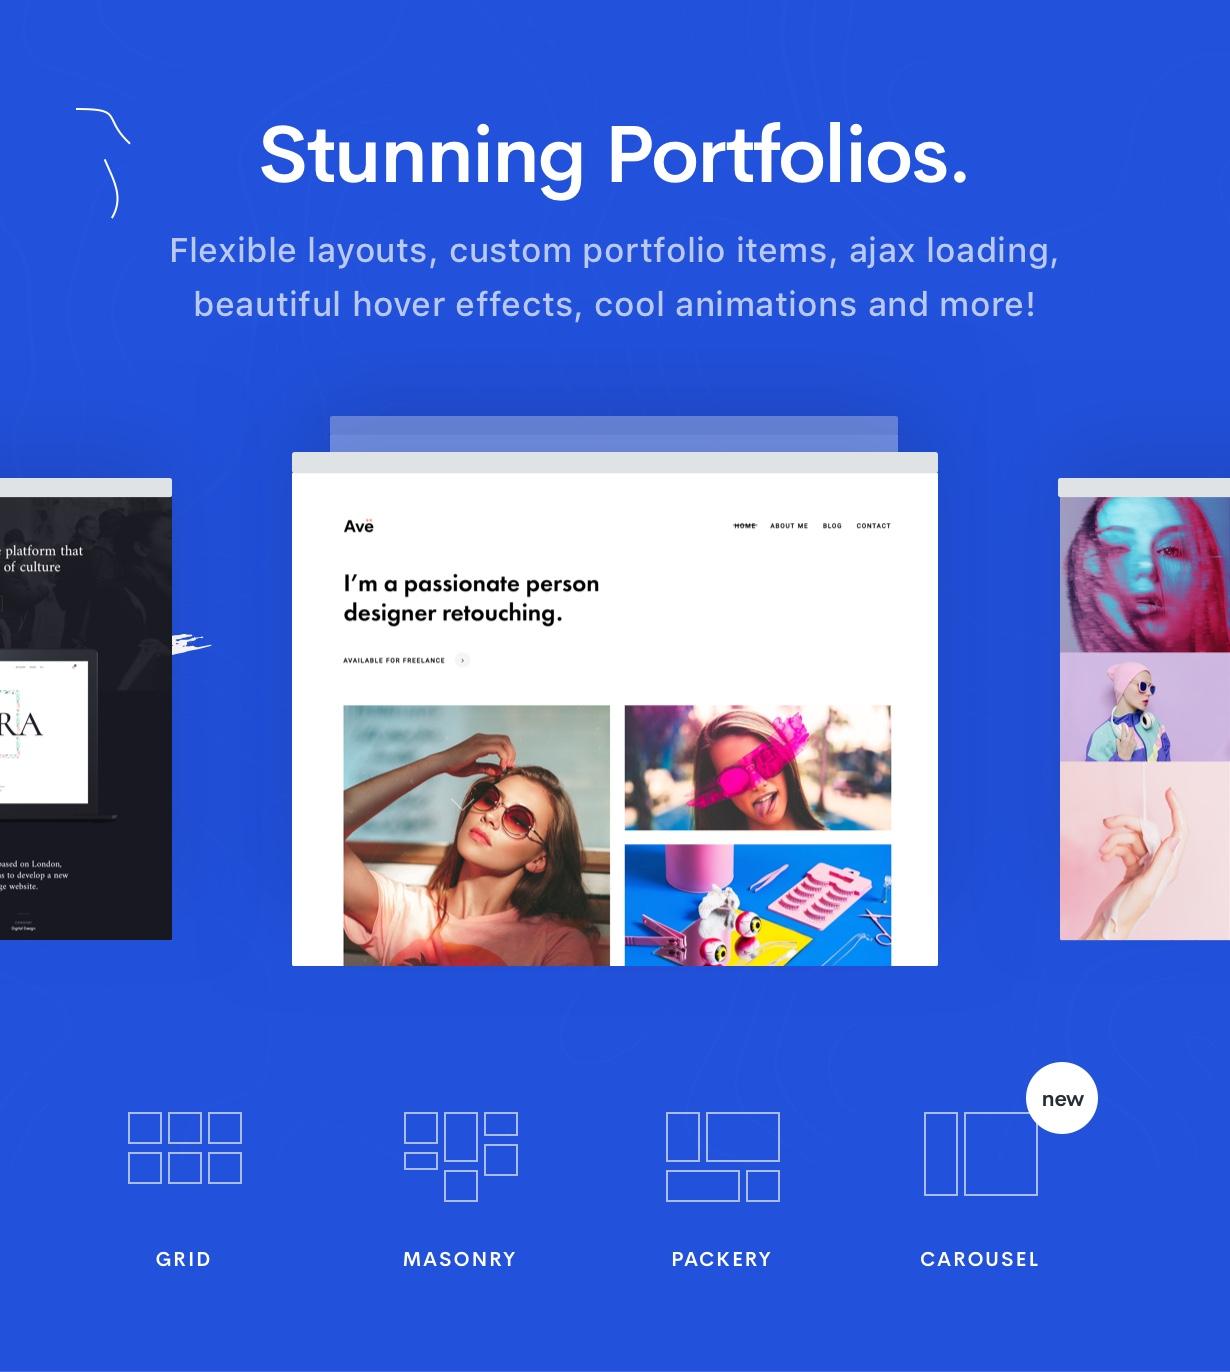 Portfolio 2 - Ave - Responsive Multi-Purpose WordPress Theme